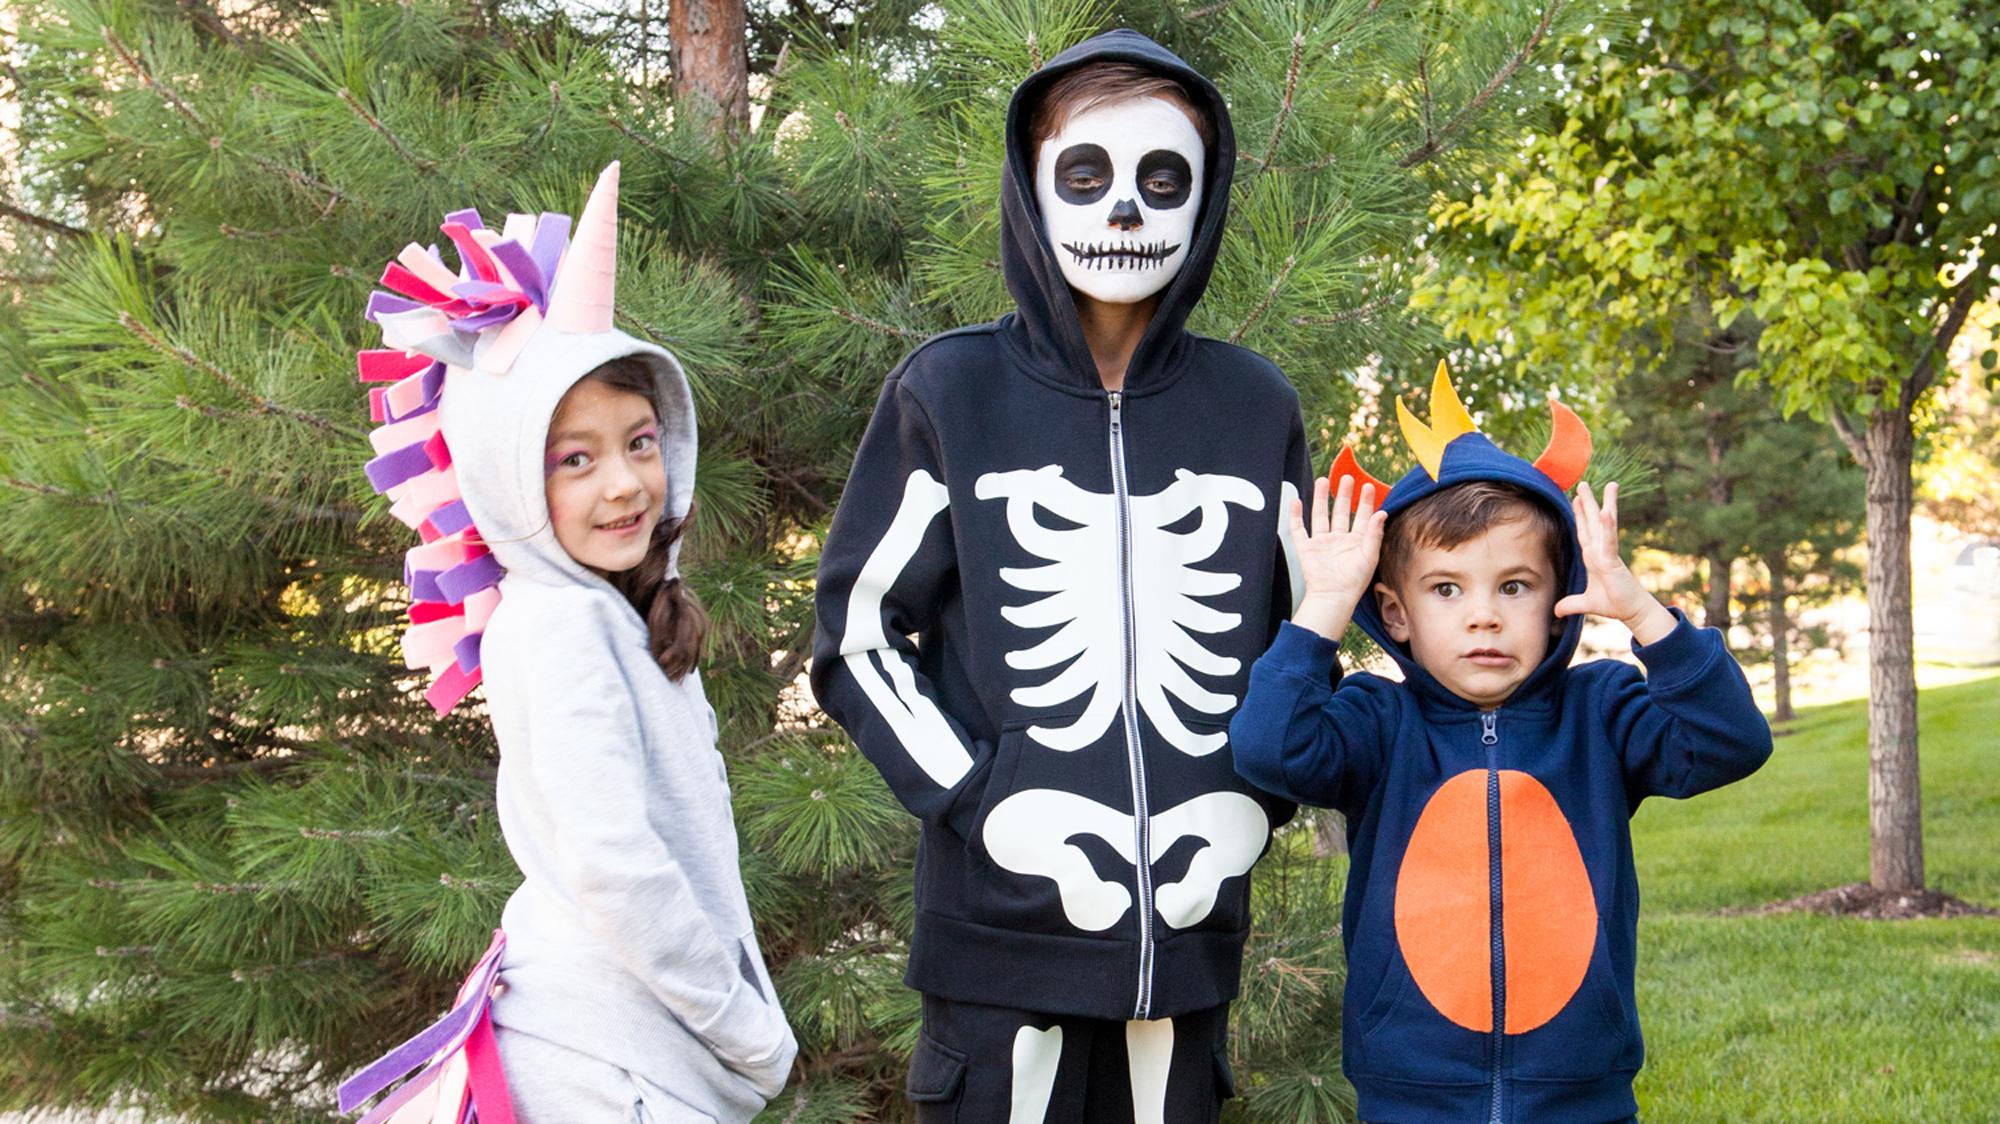 unicorn, skeleton, fish kid costumes